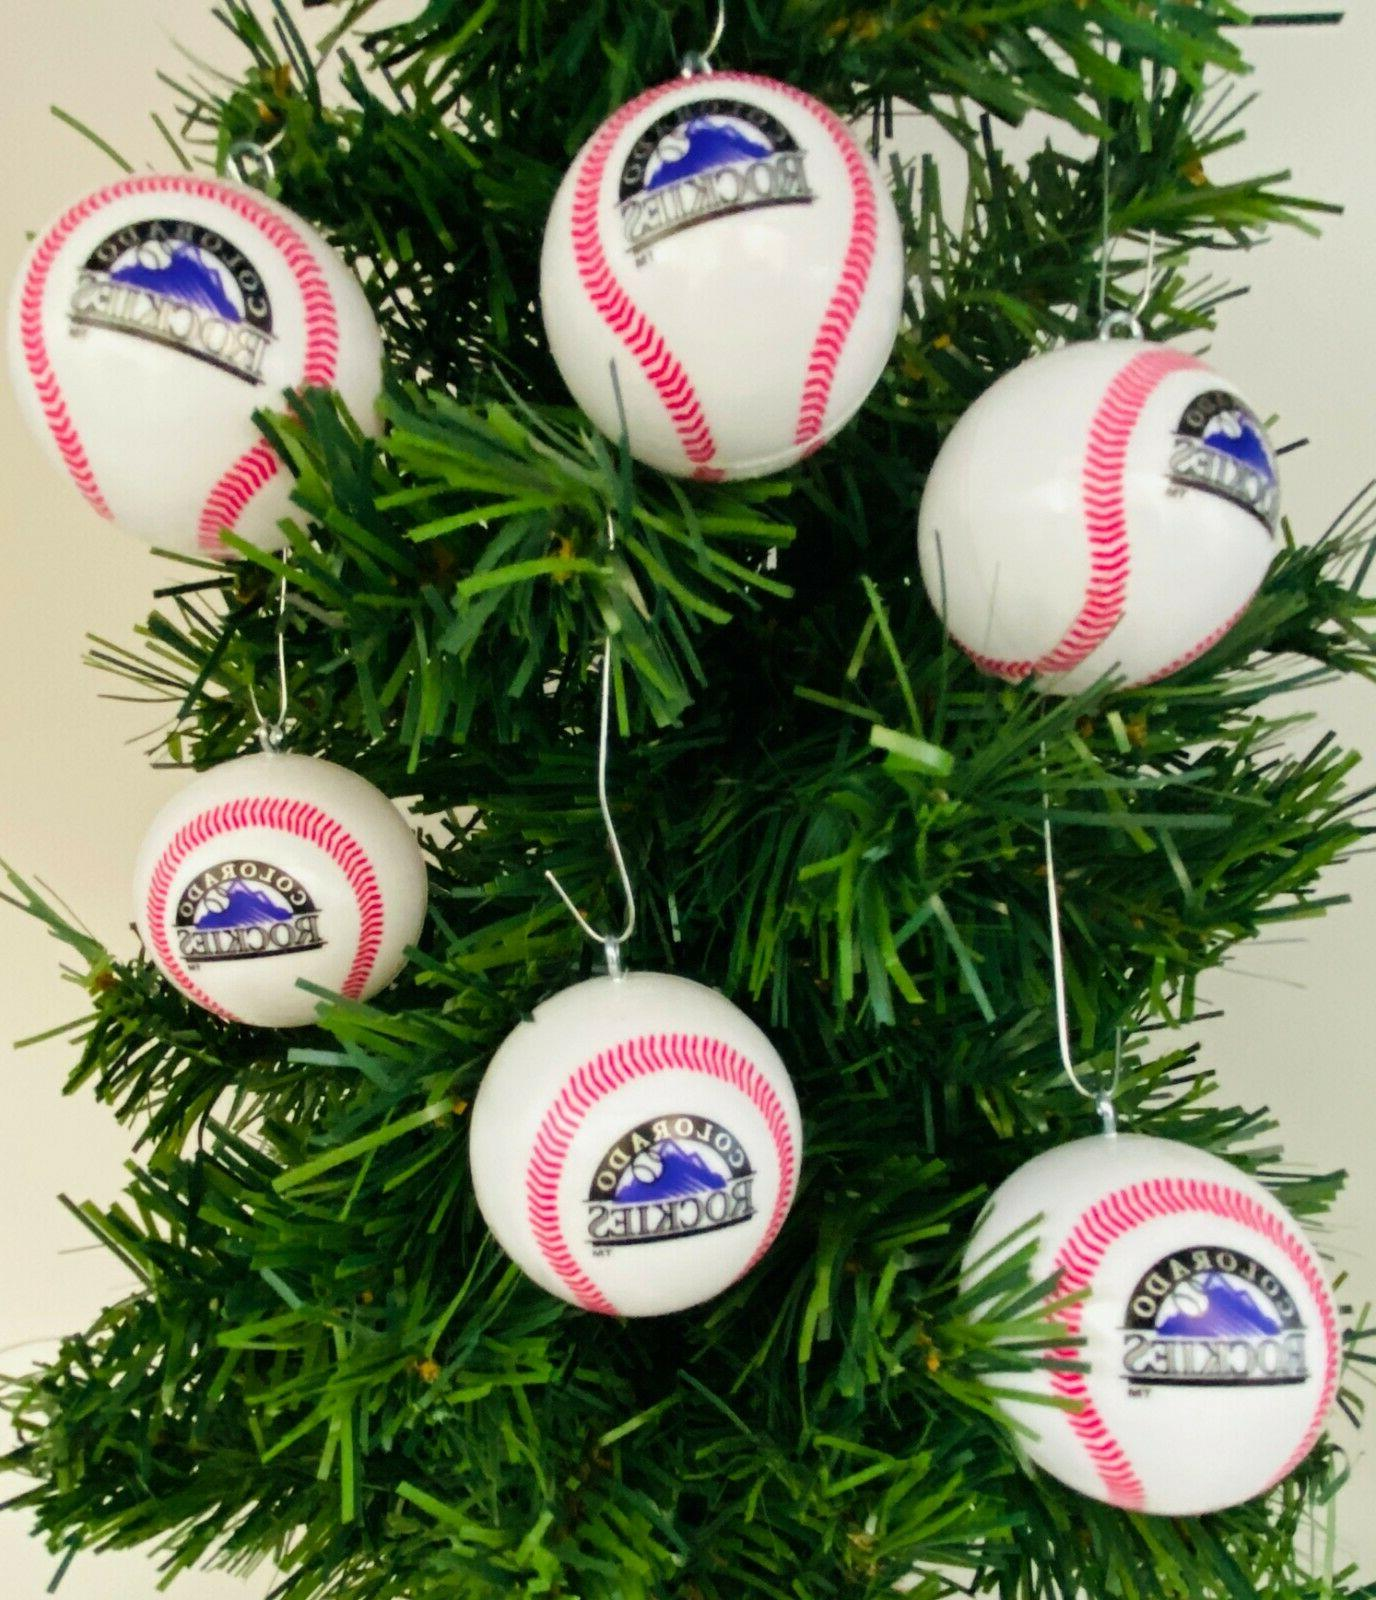 mlb colorado rockies 6 piece shatterproof baseball